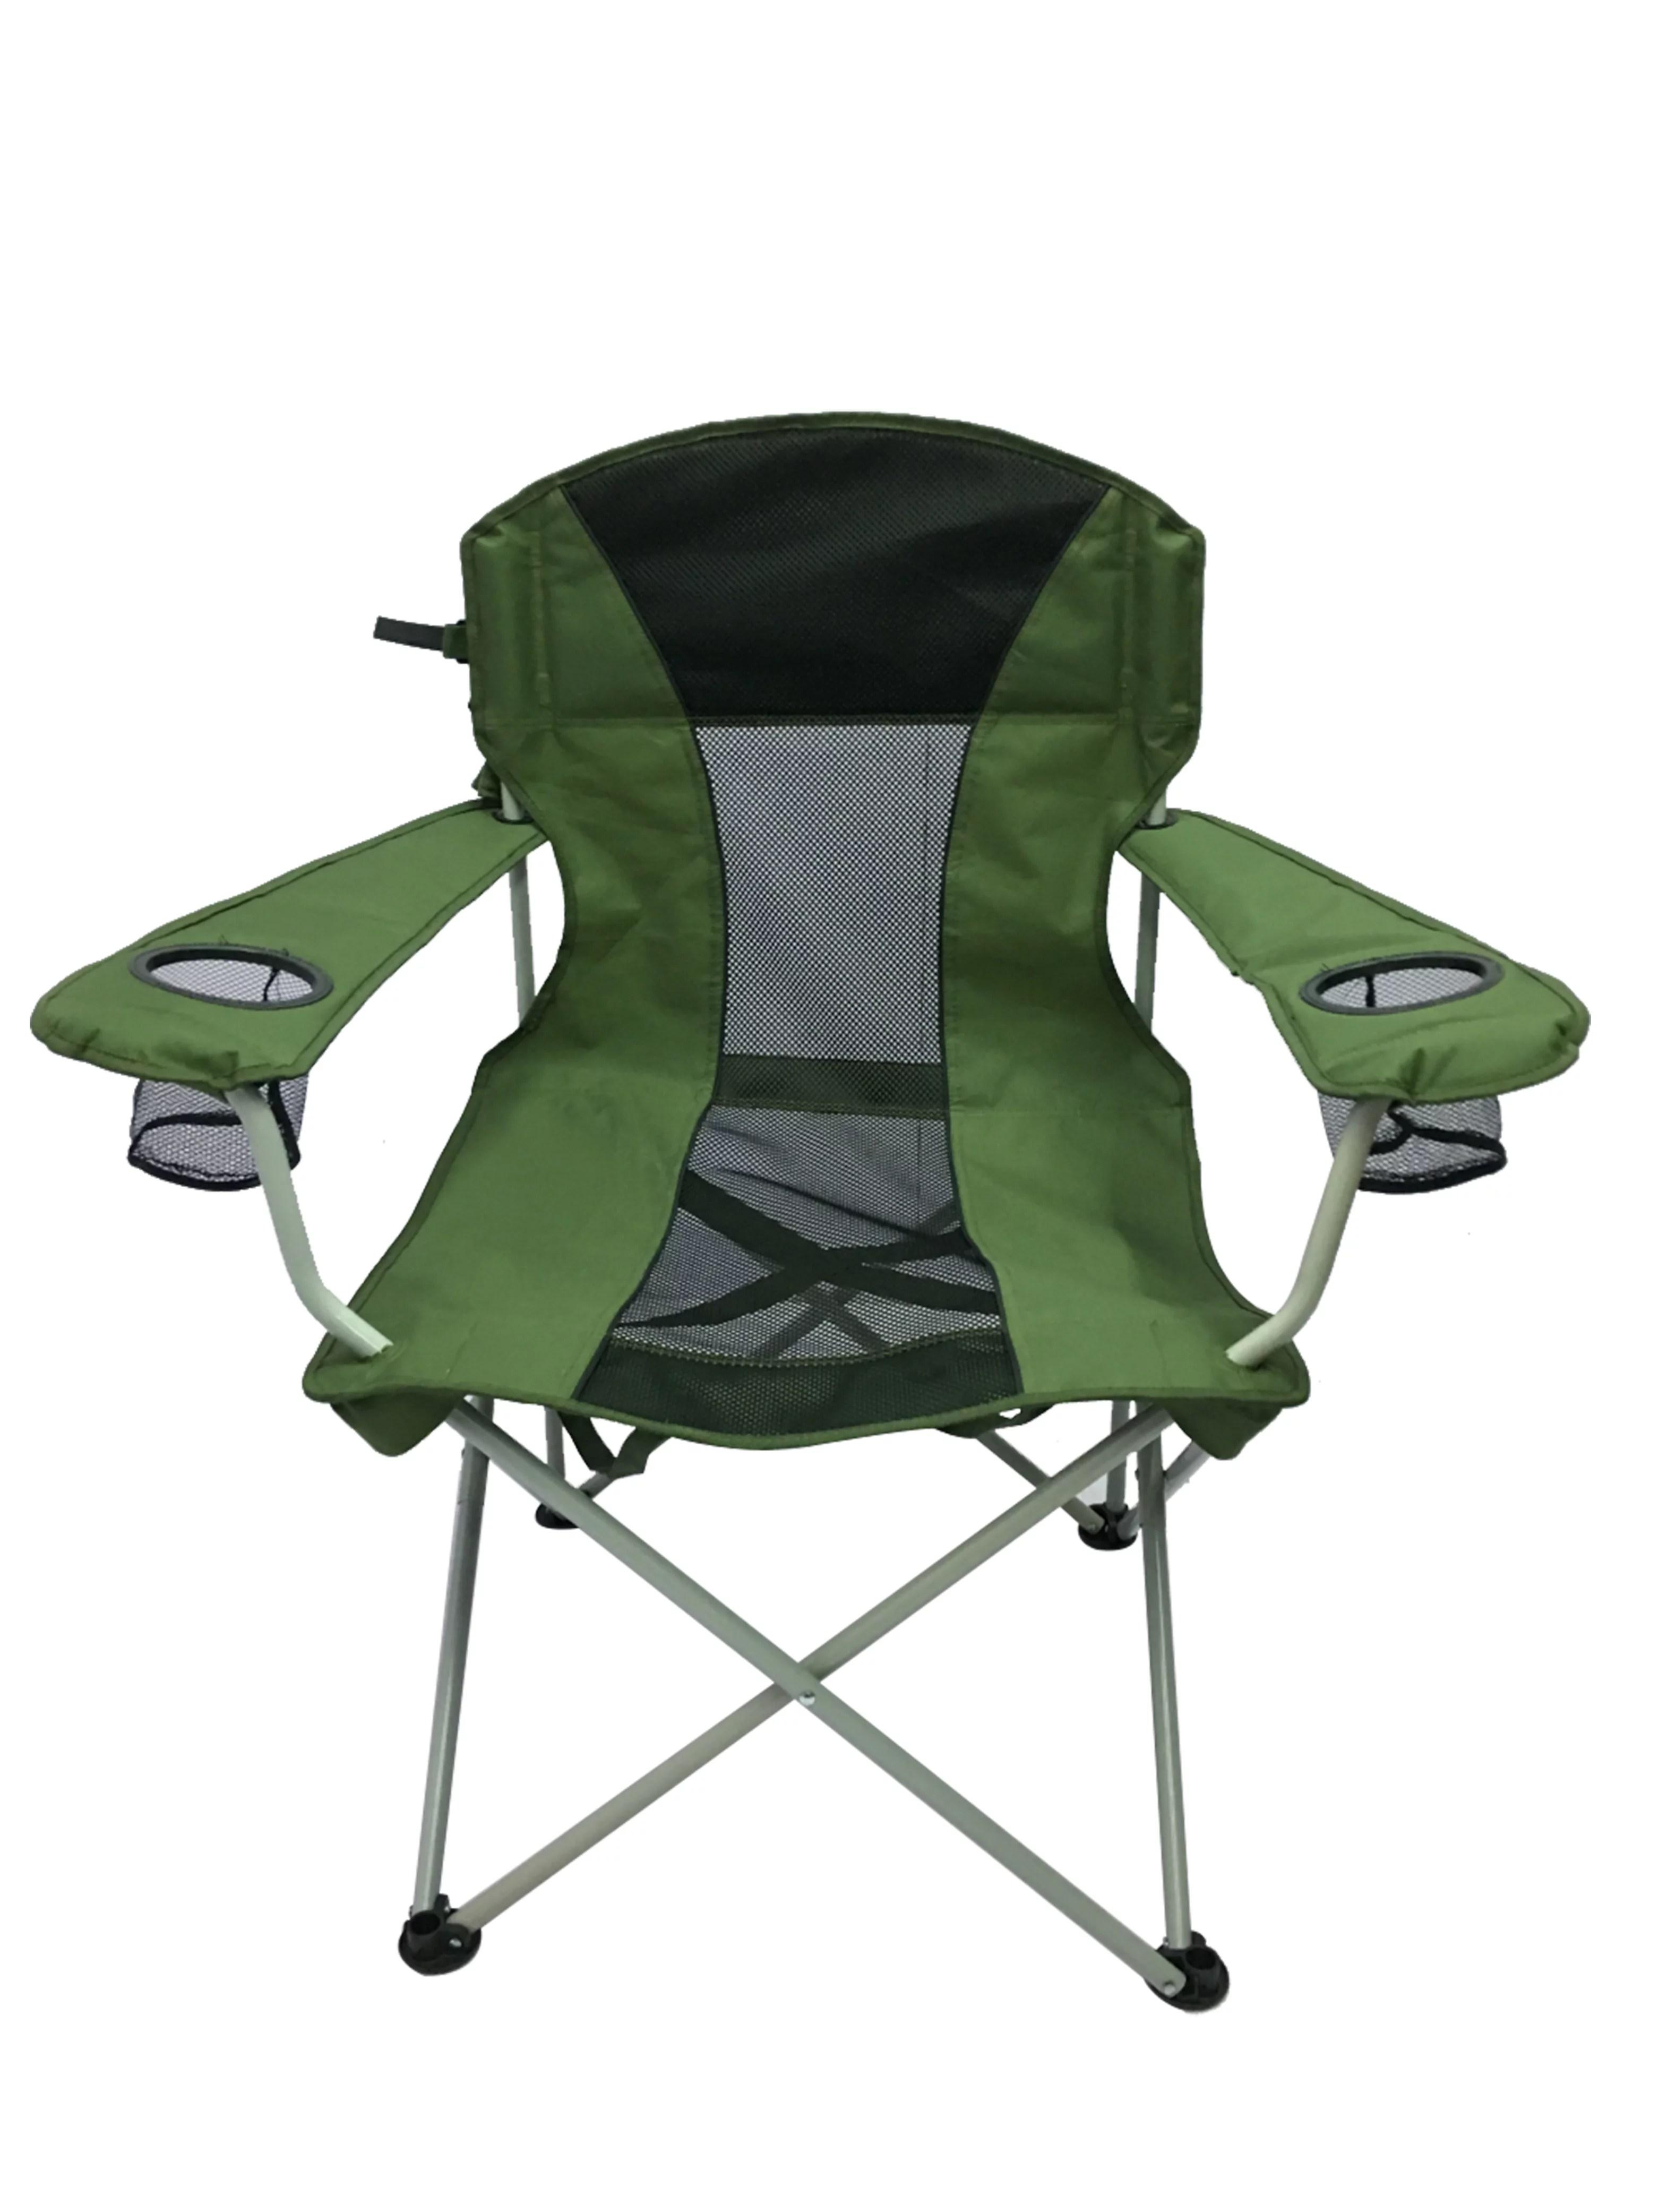 ozark trail oversized mesh chair mid century modern ot oversize green walmart